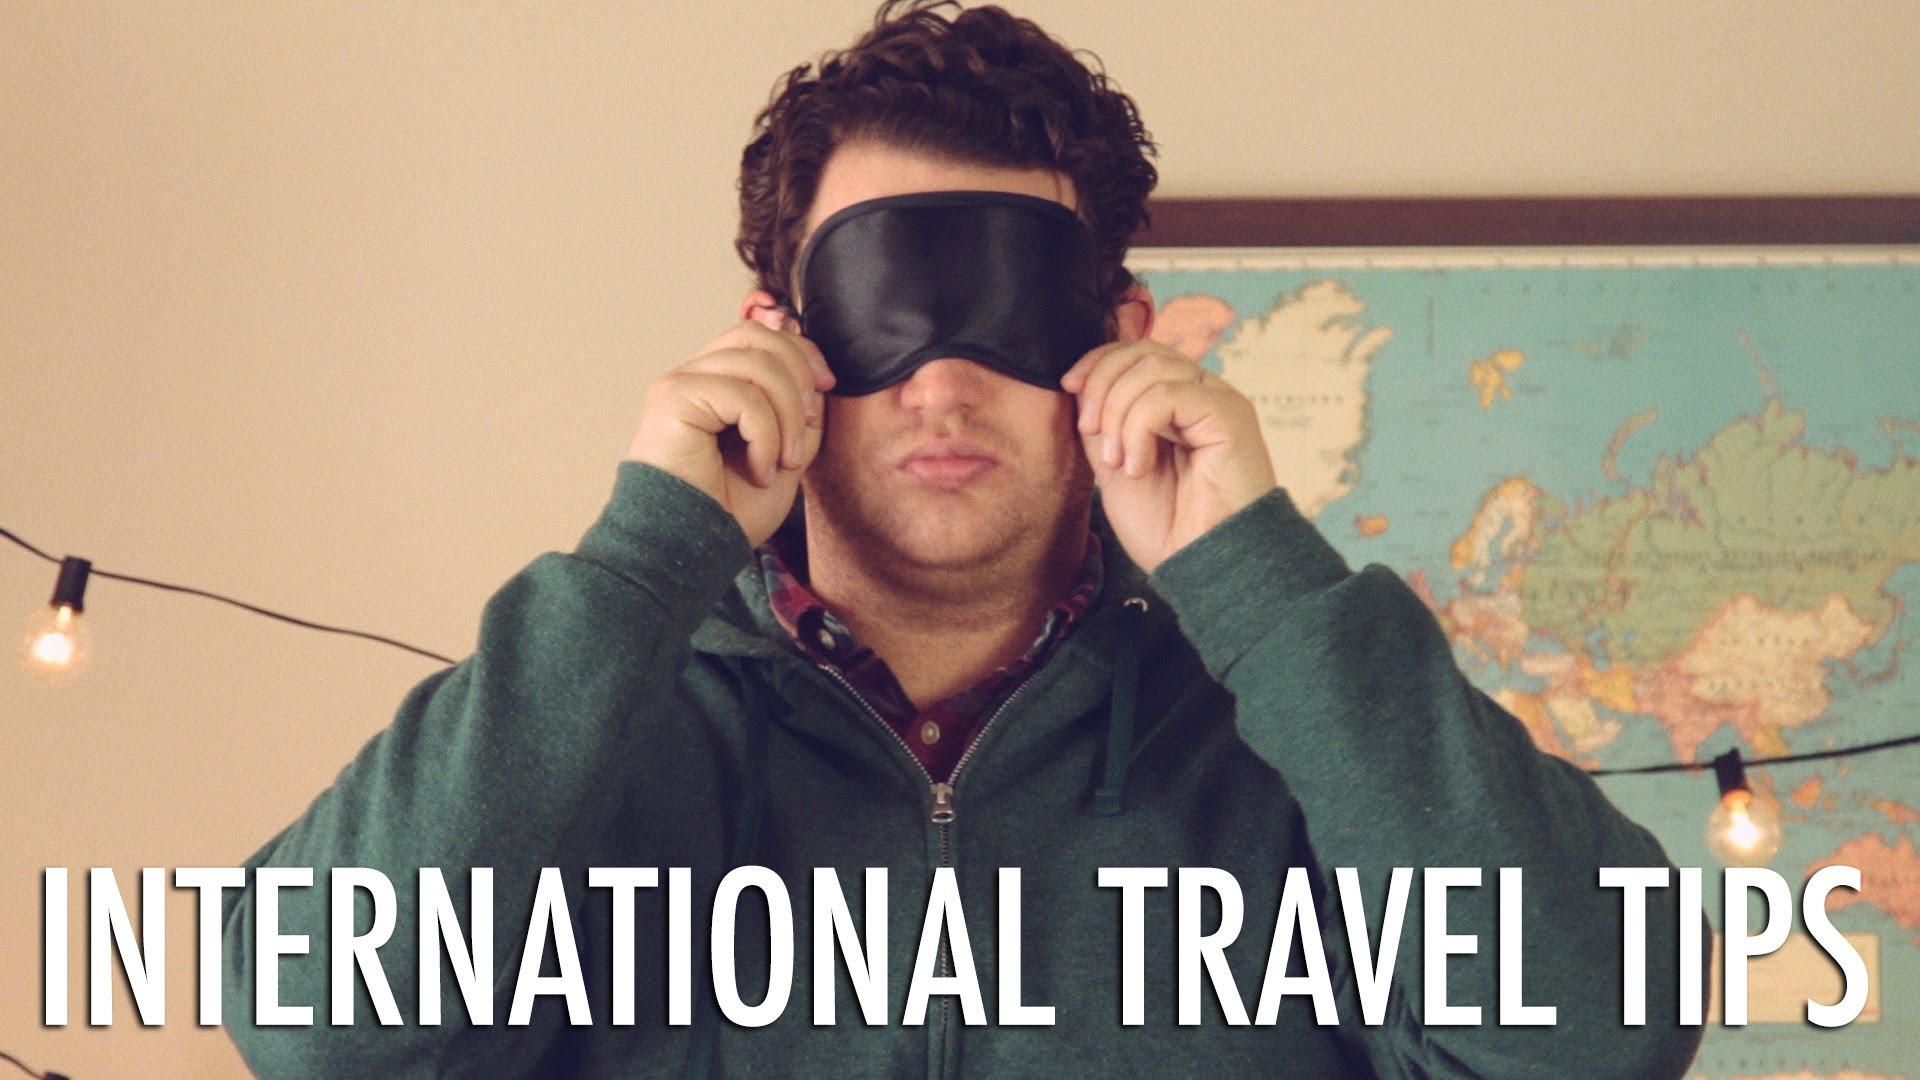 「出國好好玩、搭機好麻煩,你需要 PRO 技巧!」- Travel Tips for International Flights